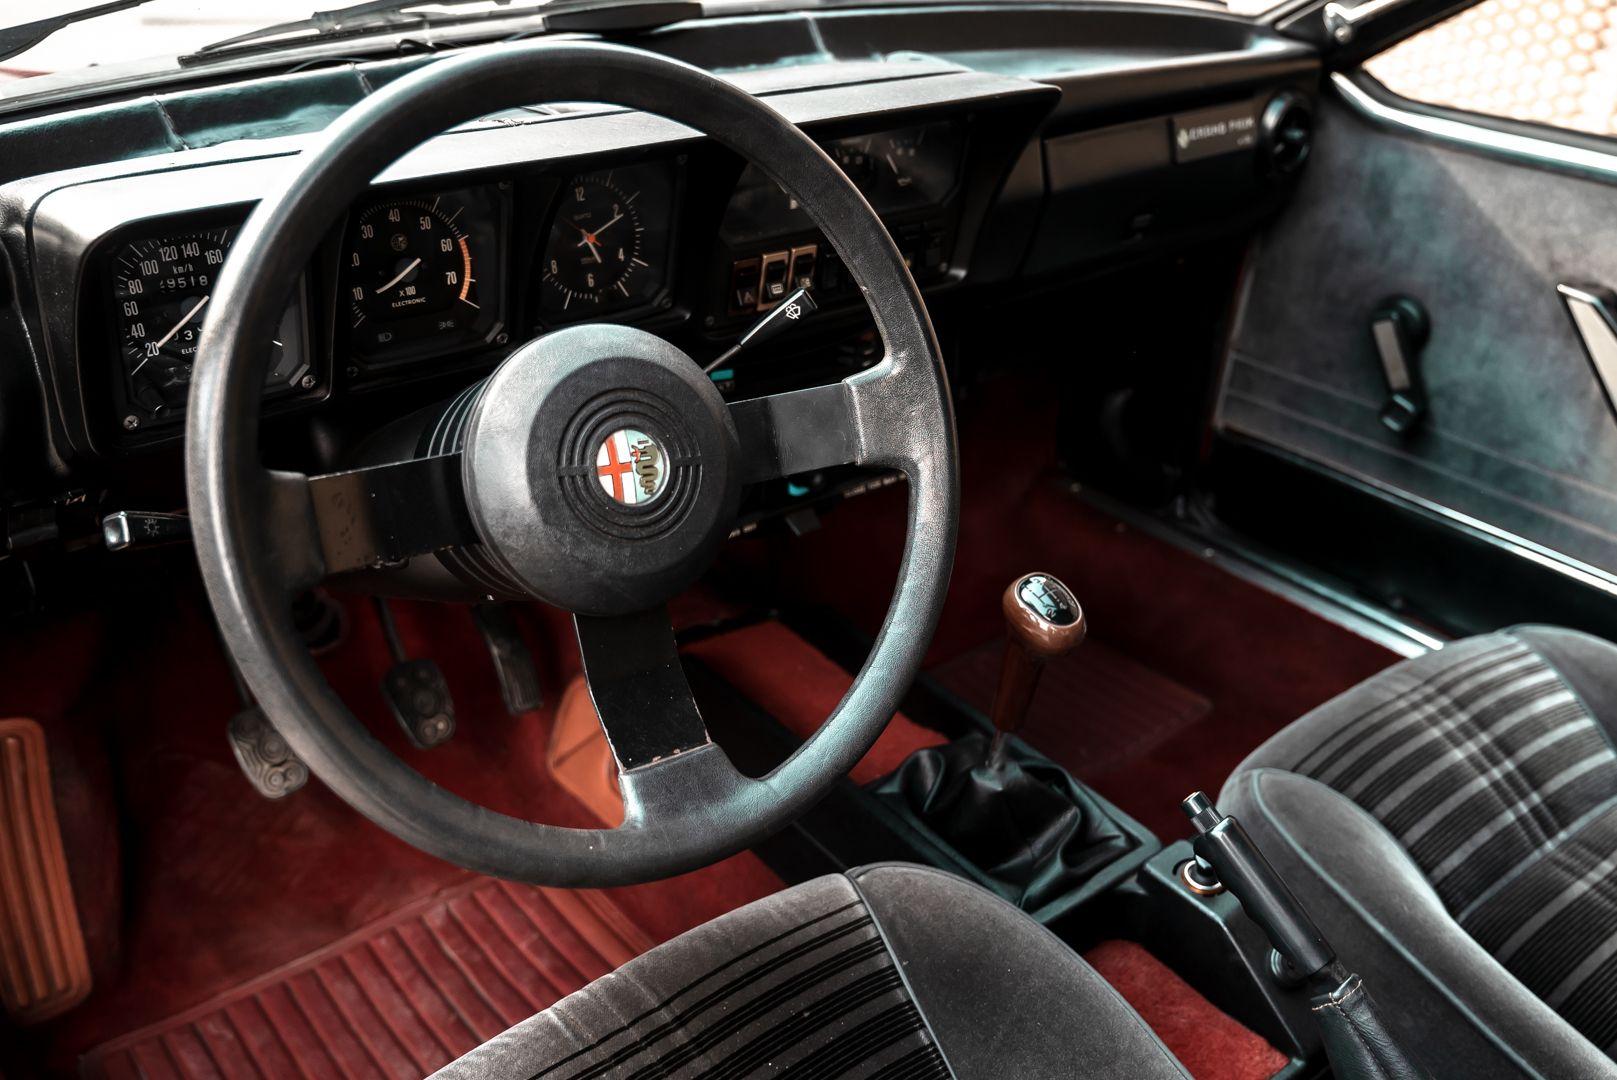 1981 Alfa Romeo Alfetta GTV Gran Prix no. 128 68583